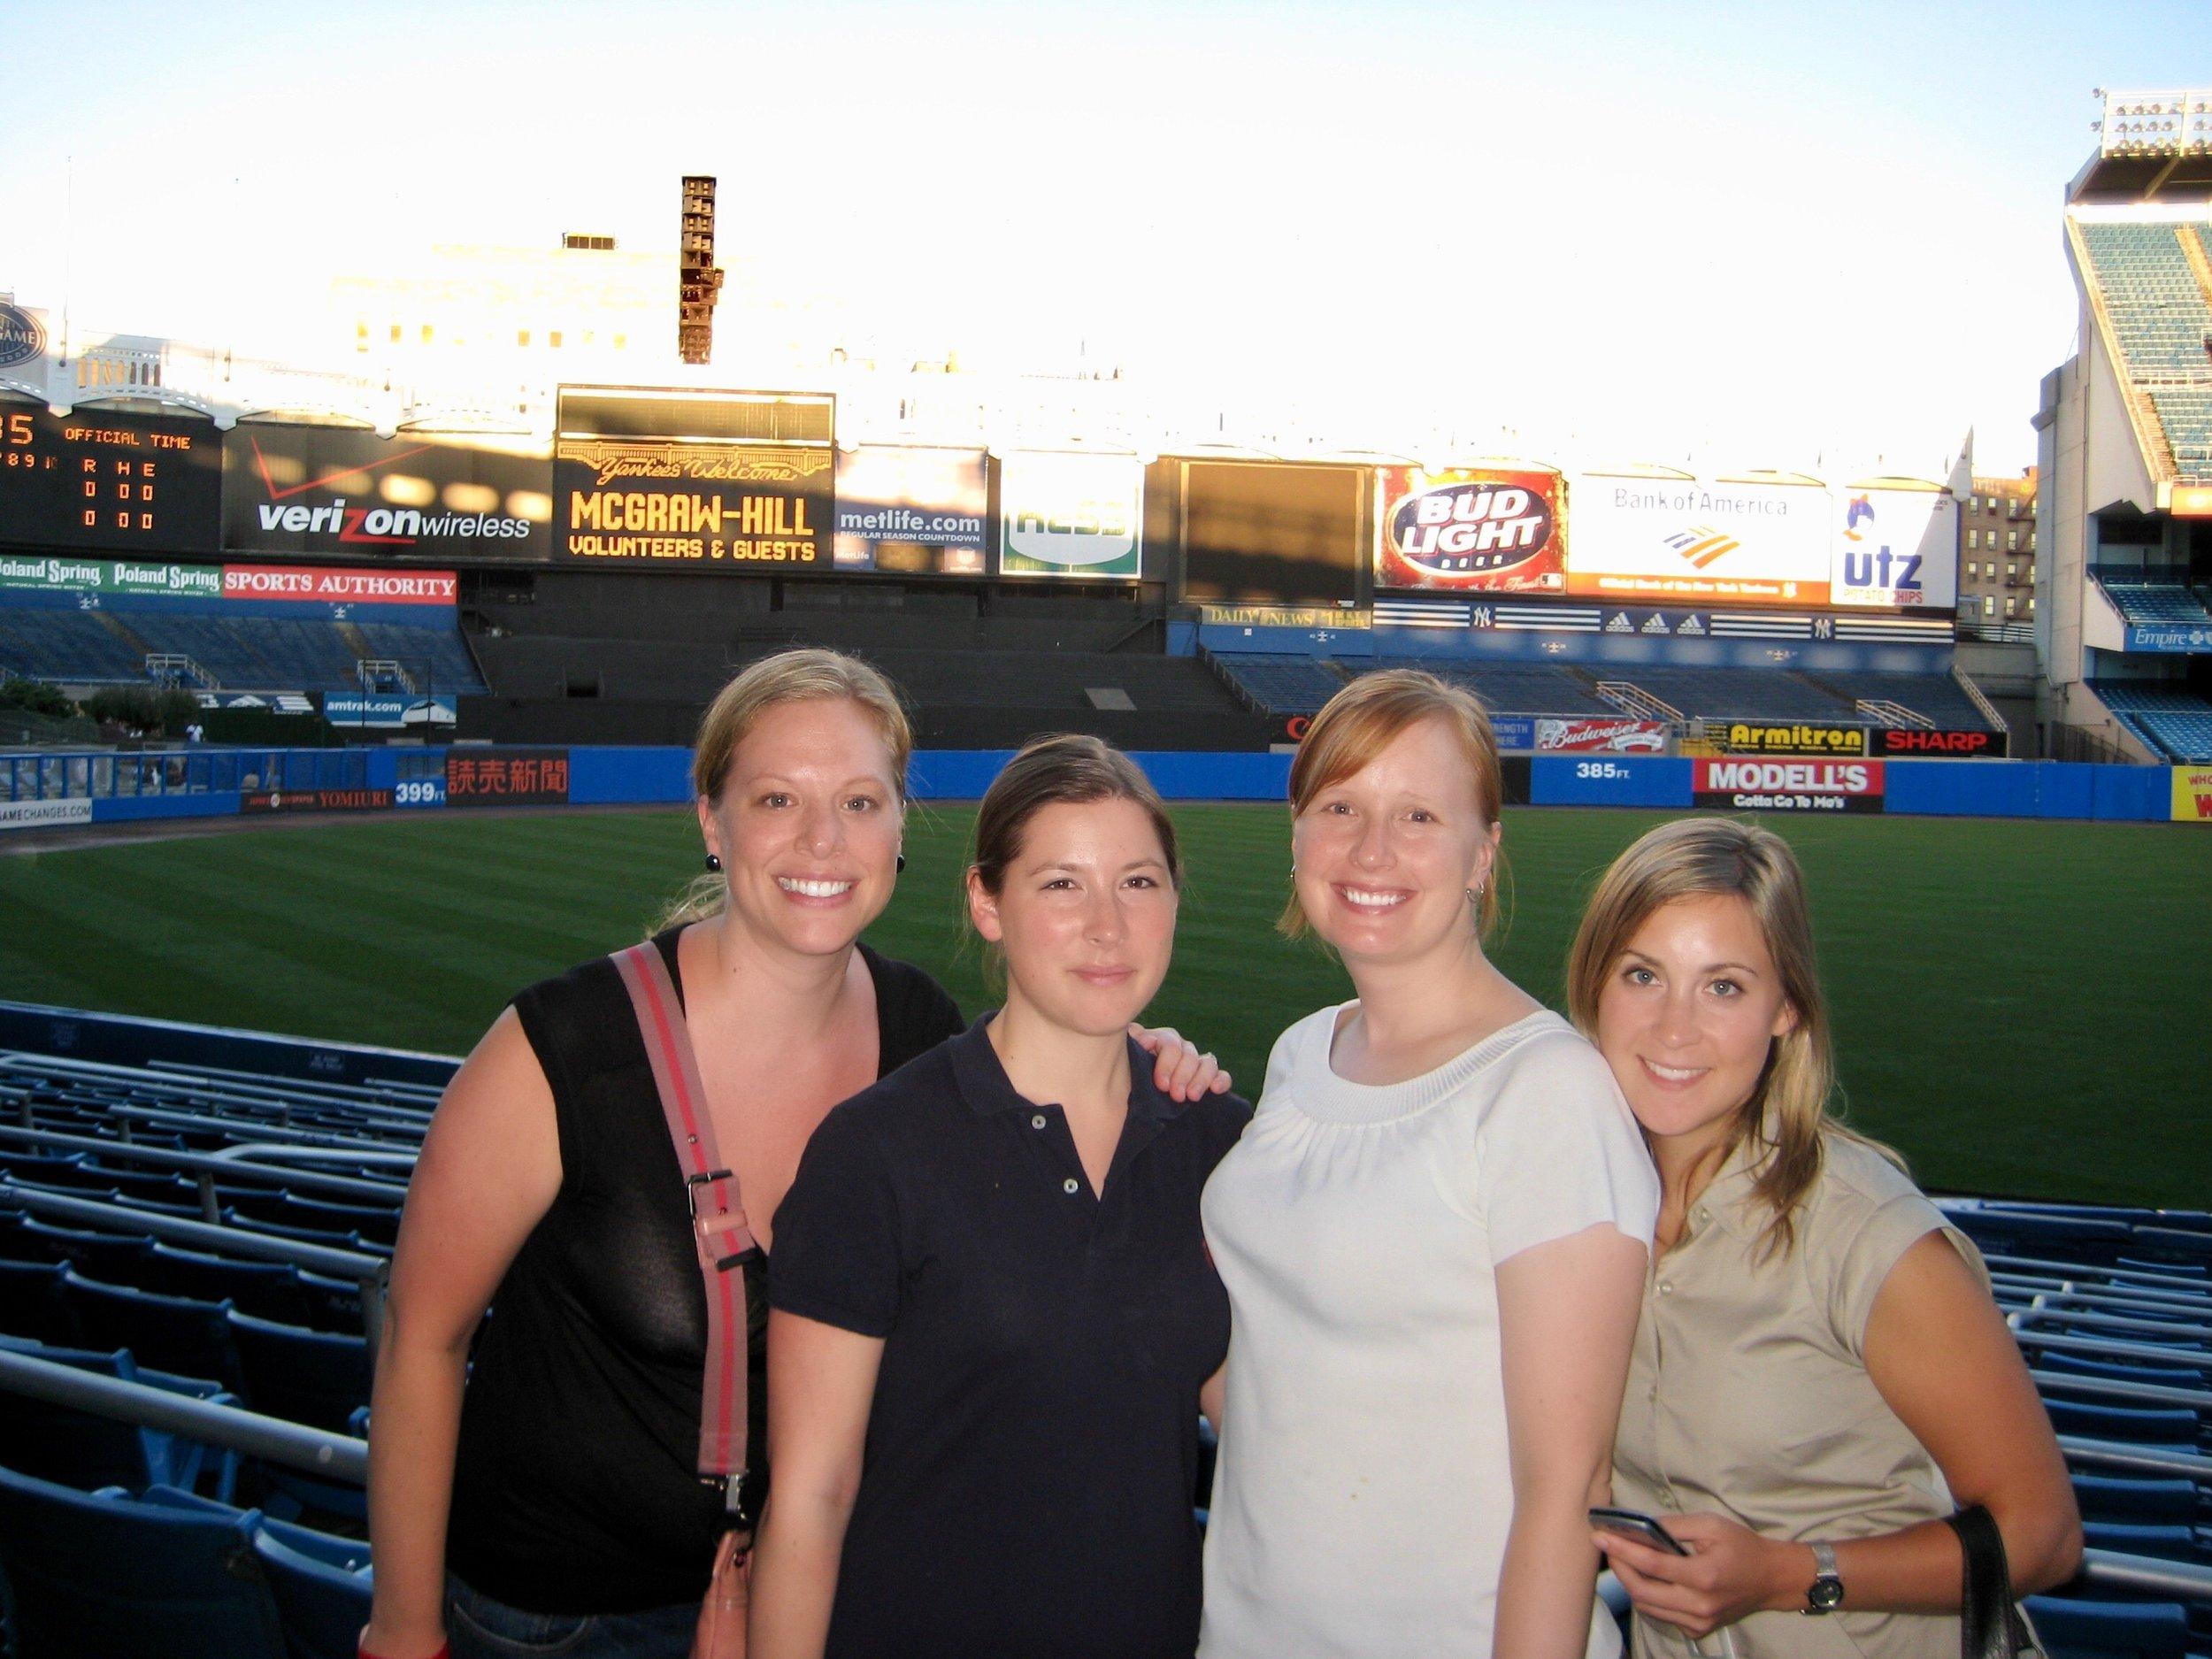 Employee evening out at Yankee Stadium.